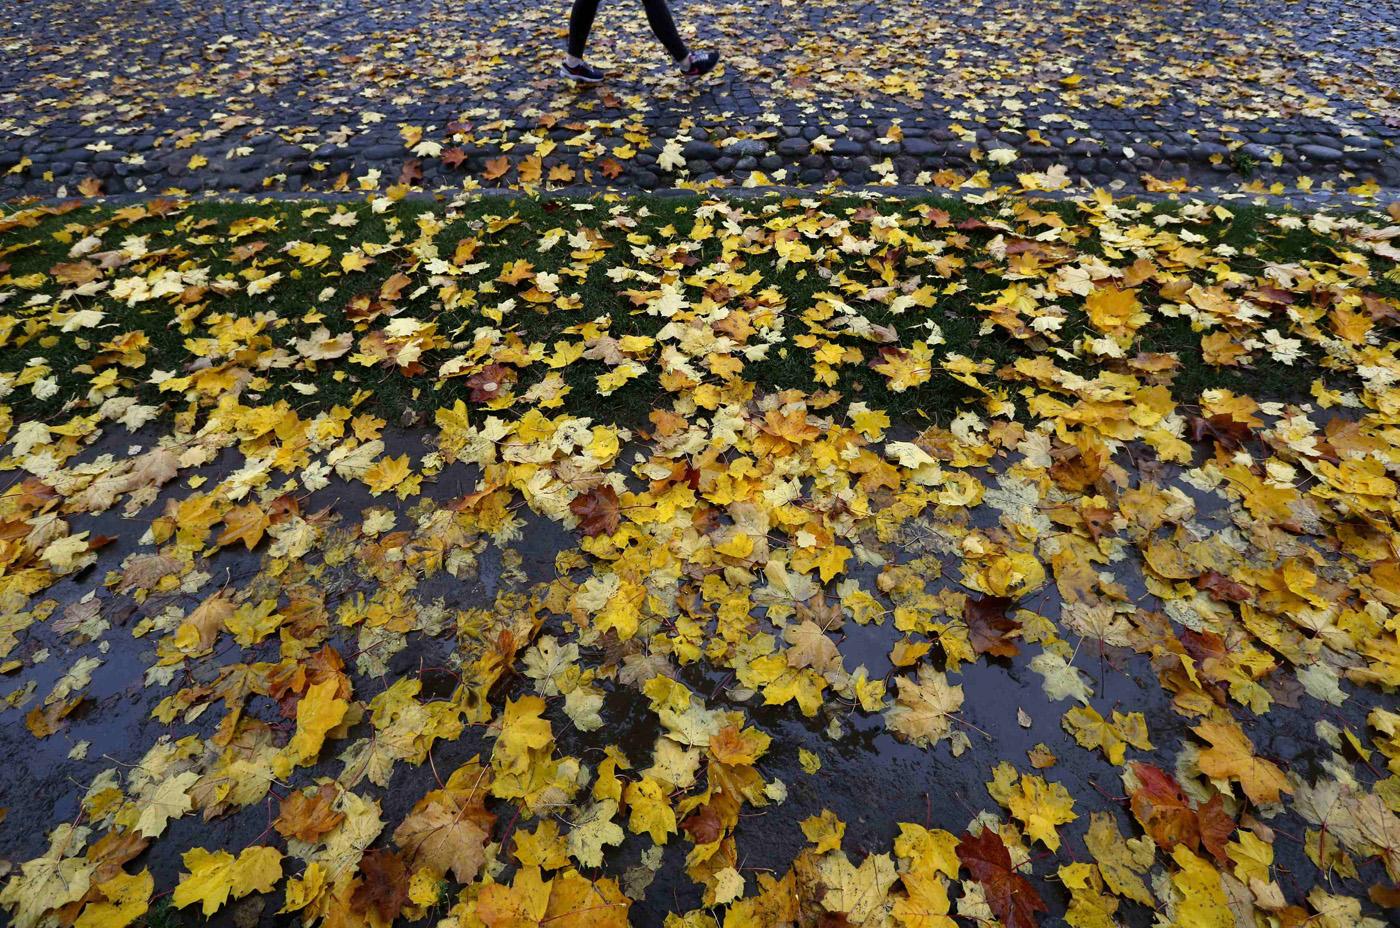 Fall foliage: Mother Nature's autumn show